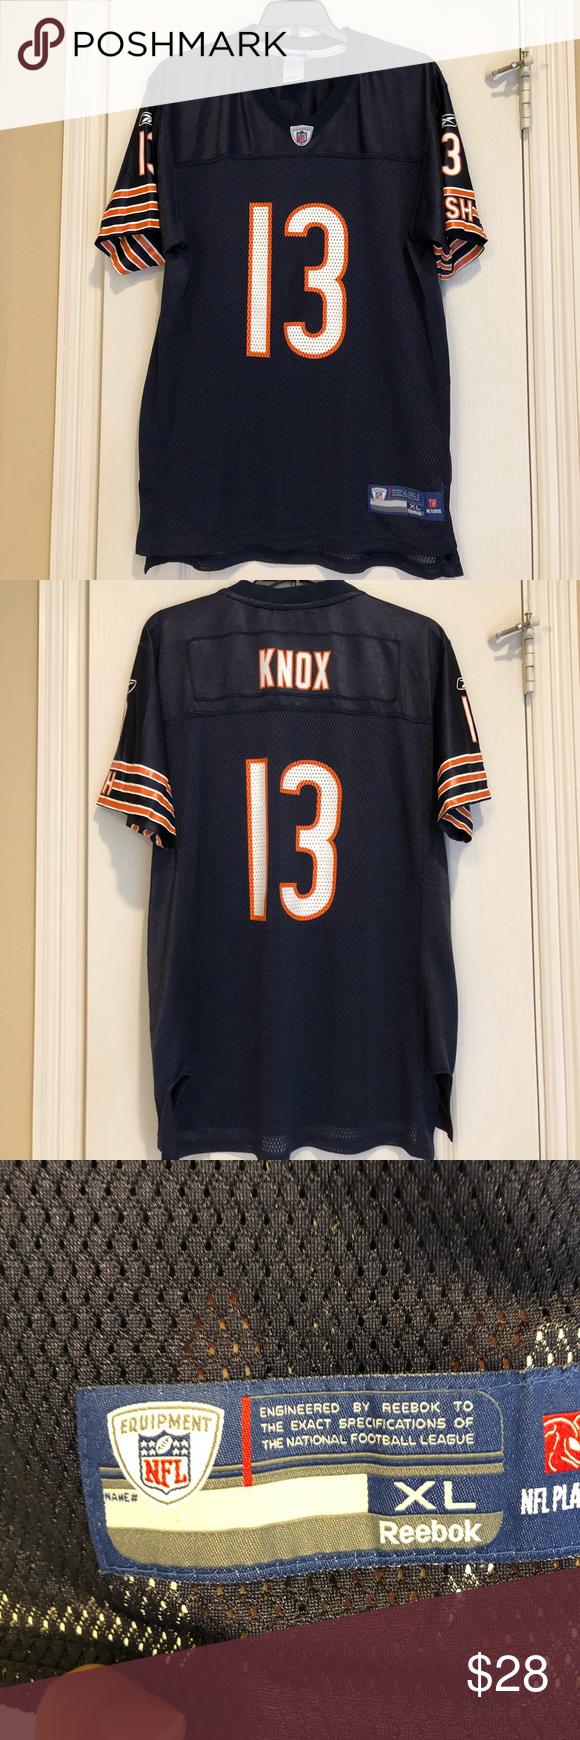 Reebok Nfl Chicago Bears Jersey Knox Reebok Chicago Bears 13 Johnny Knox Replica Nfl Football Jersey By Reebok Chicago Bears Jersey Nfl Chicago Bears Reebok